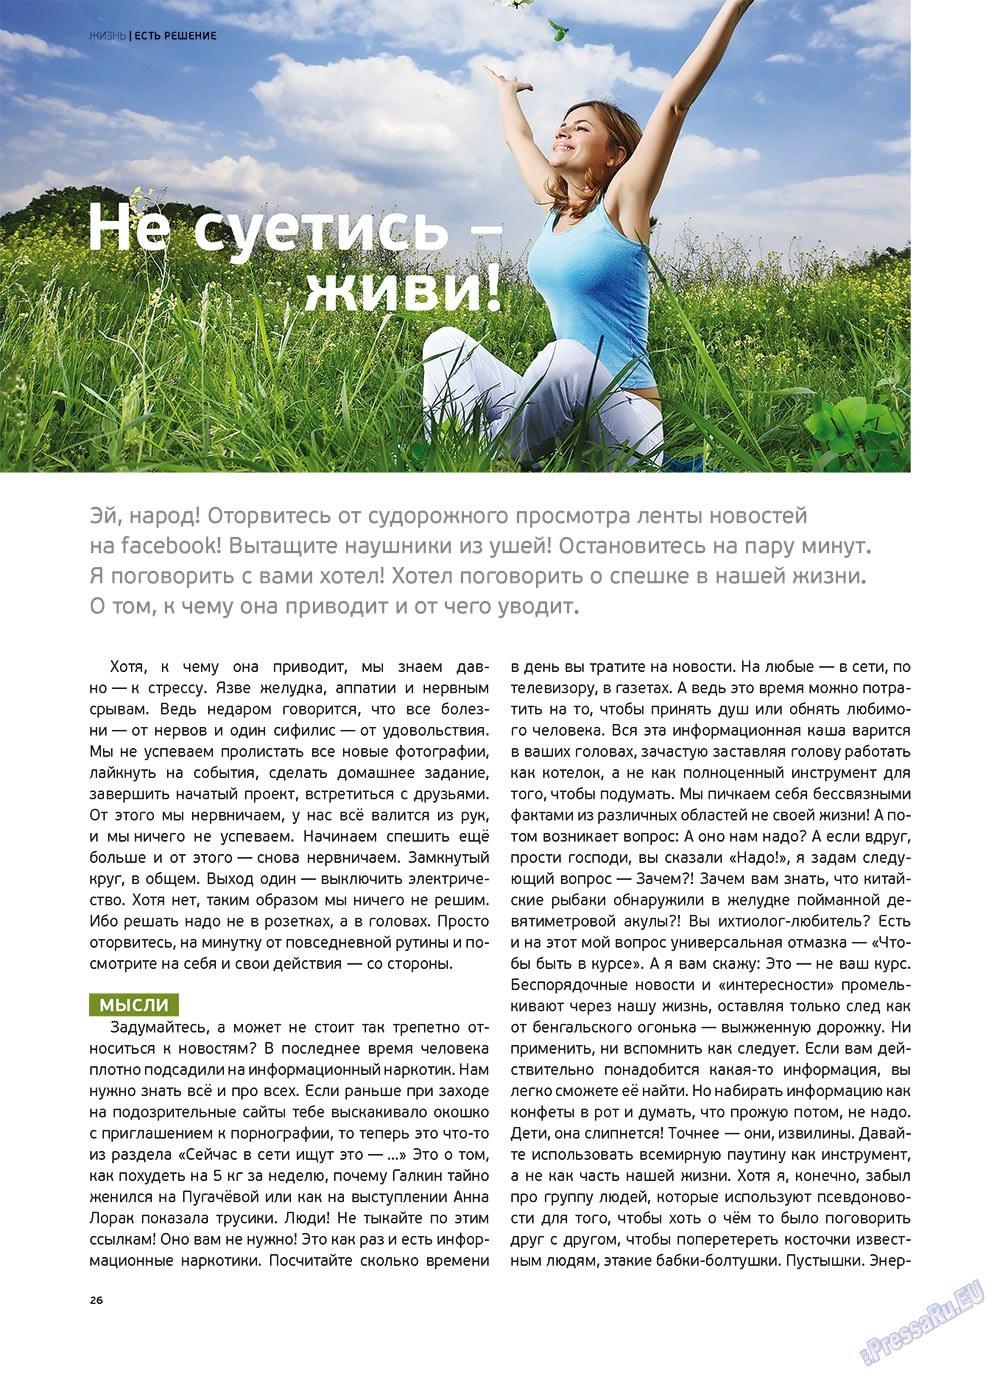 Артек (журнал). 2011 год, номер 6, стр. 28